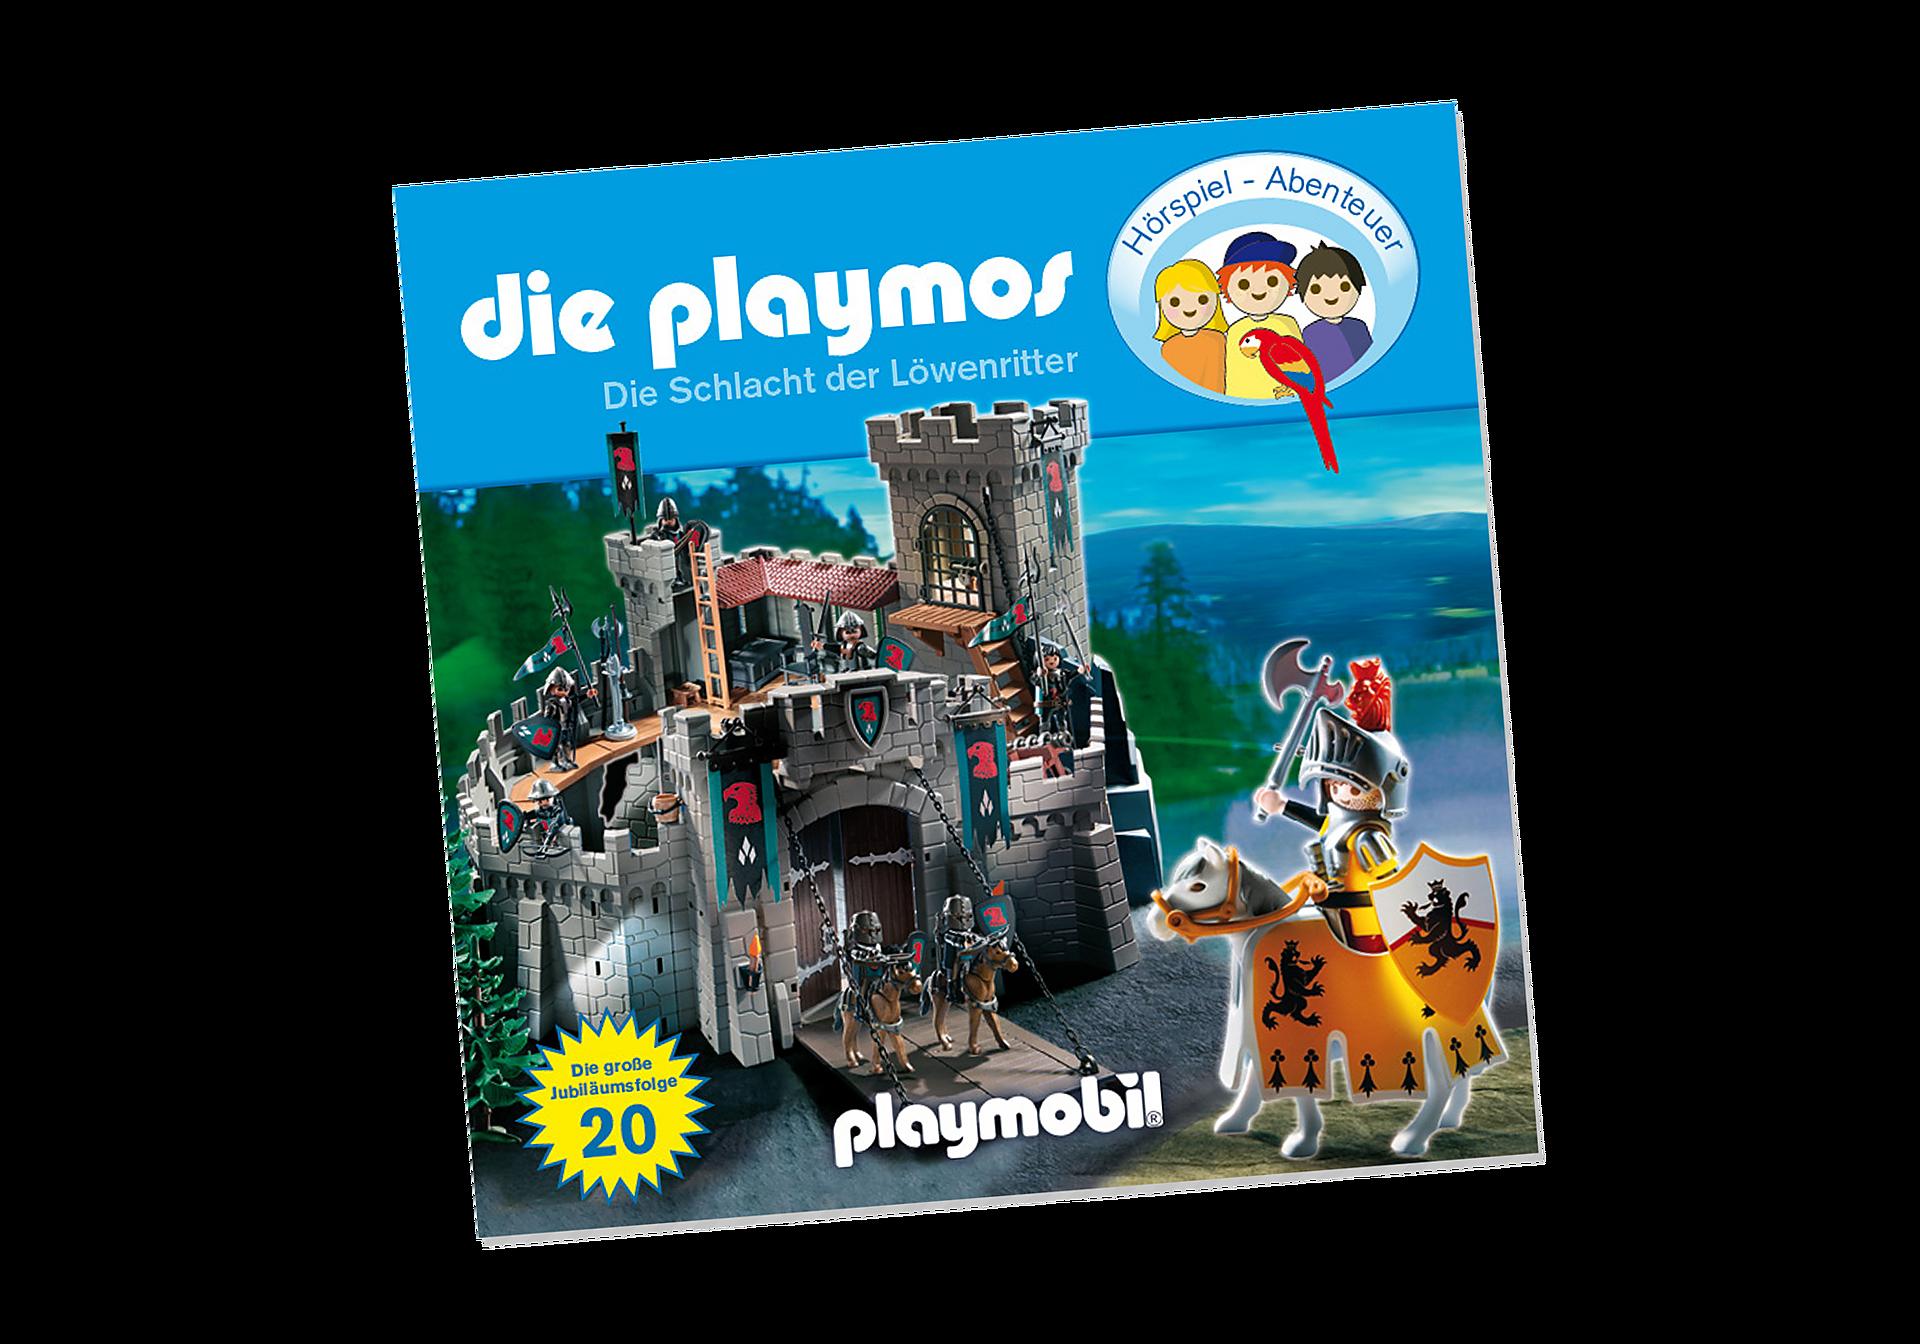 http://media.playmobil.com/i/playmobil/80273_product_detail/Die große Schlacht der Löwenritter (20) - CD